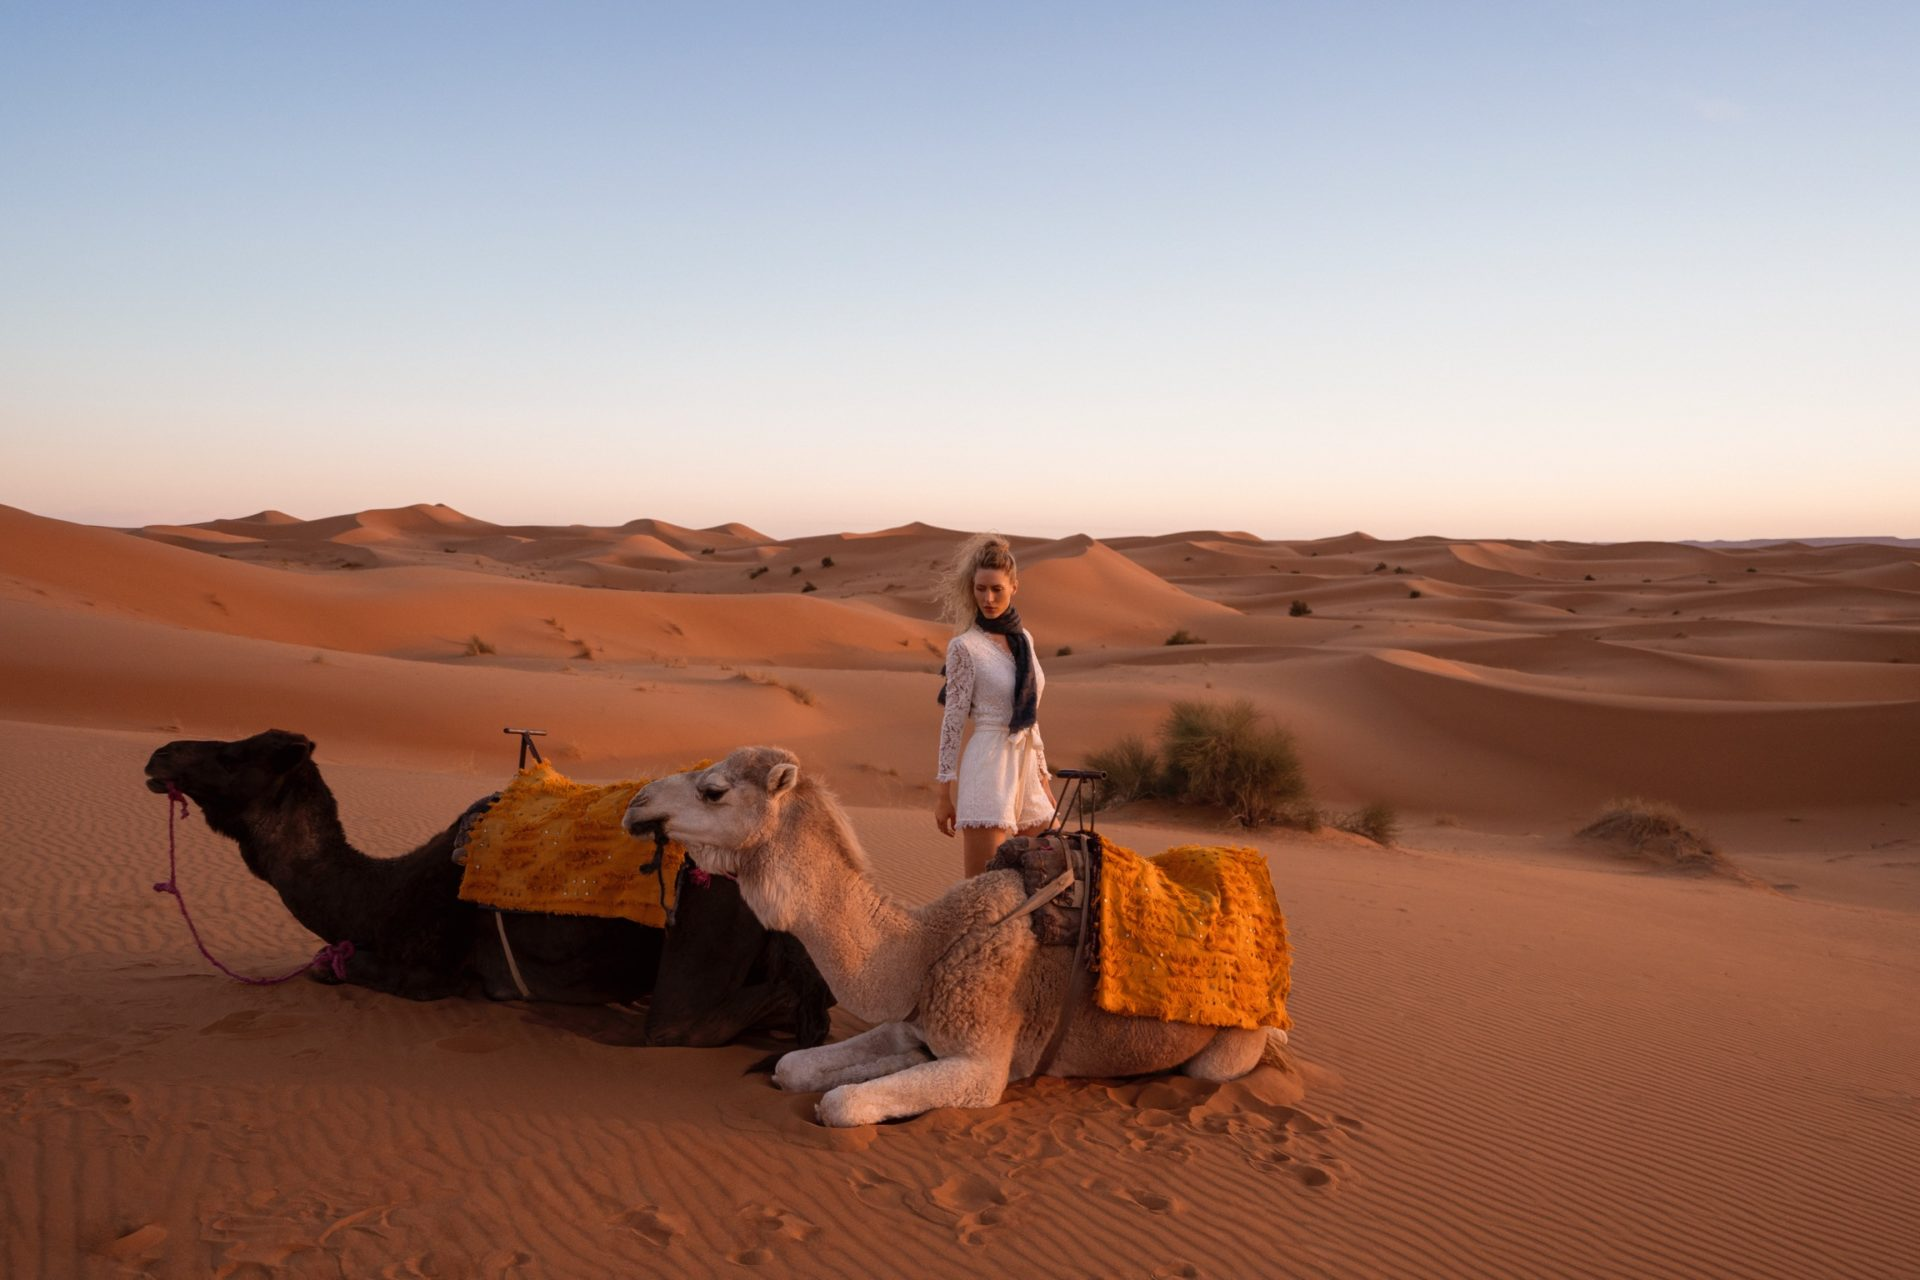 Woman and camel in Sahara Desert at sunset